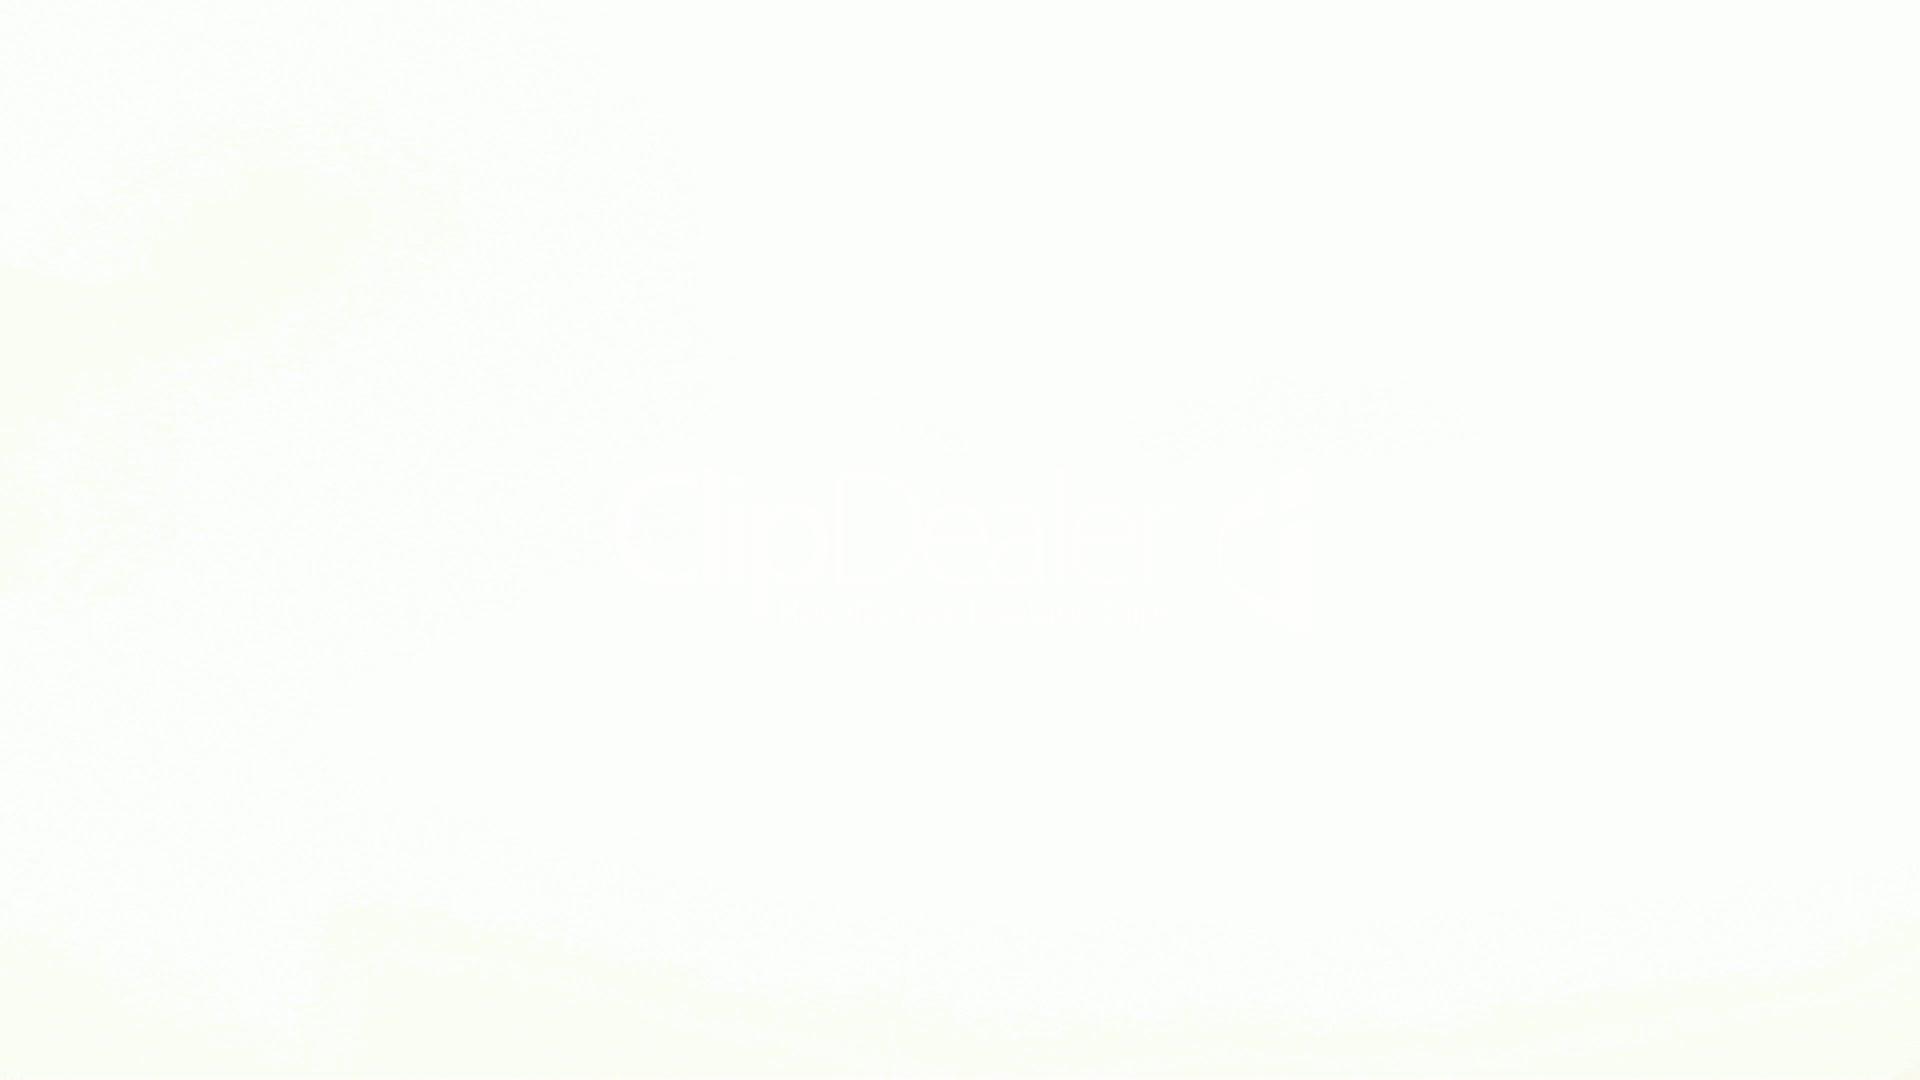 Hd wallpaper white background - White Background Wallpapers Hd Background Wallpaper Hd 1080p